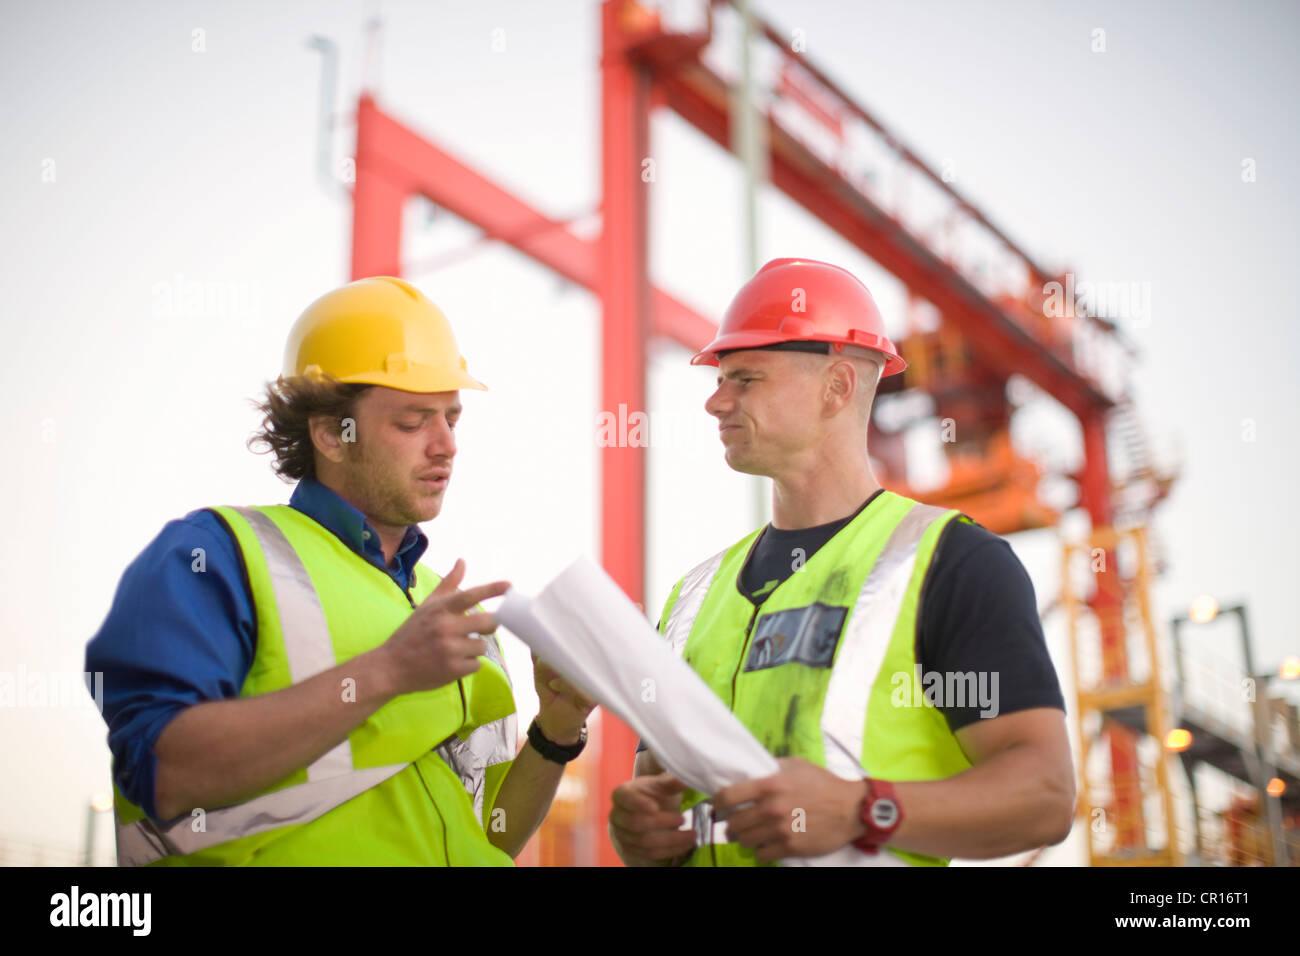 Bauarbeiter im Gespräch vor Ort Stockbild